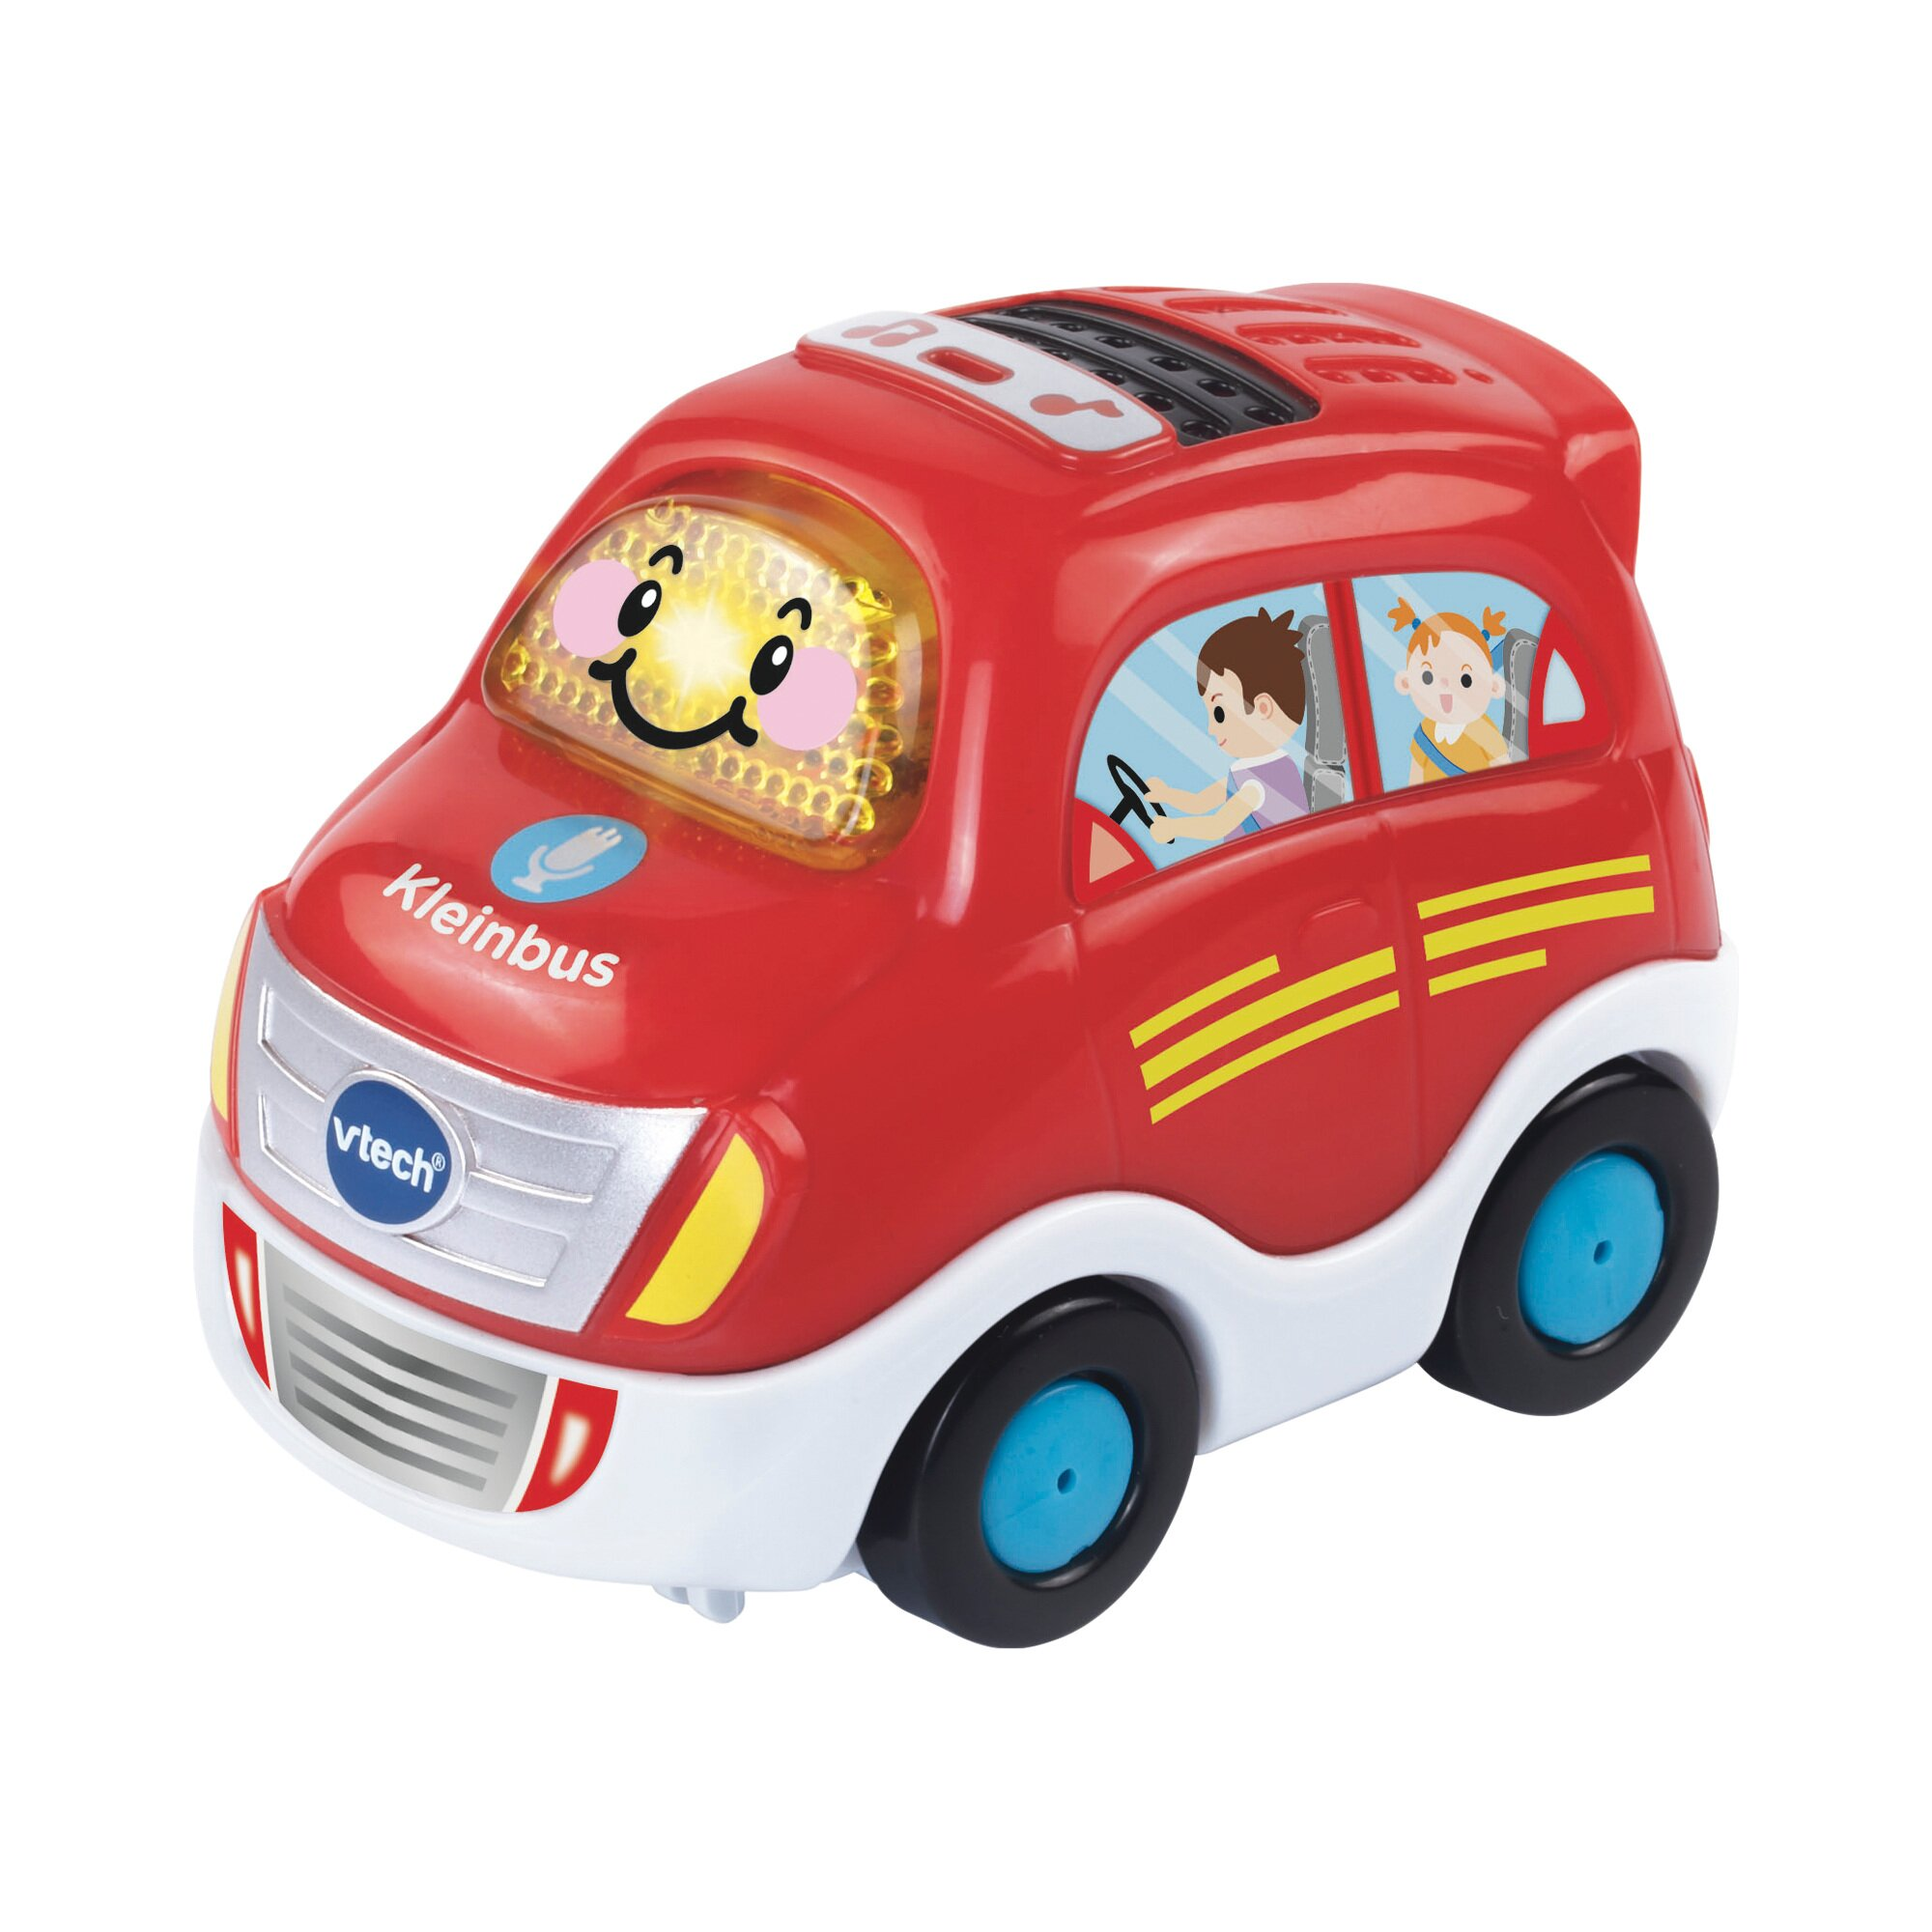 tut-tut-baby-flitzer-kleinbus-personalisierbar-, 10.99 EUR @ babywalz-de